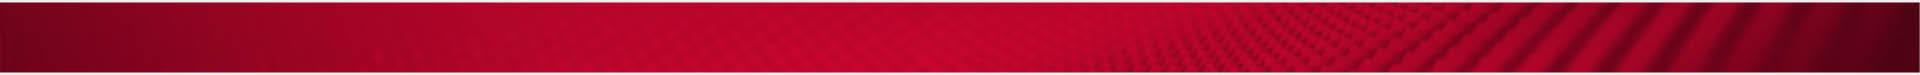 Husky Footer Banner